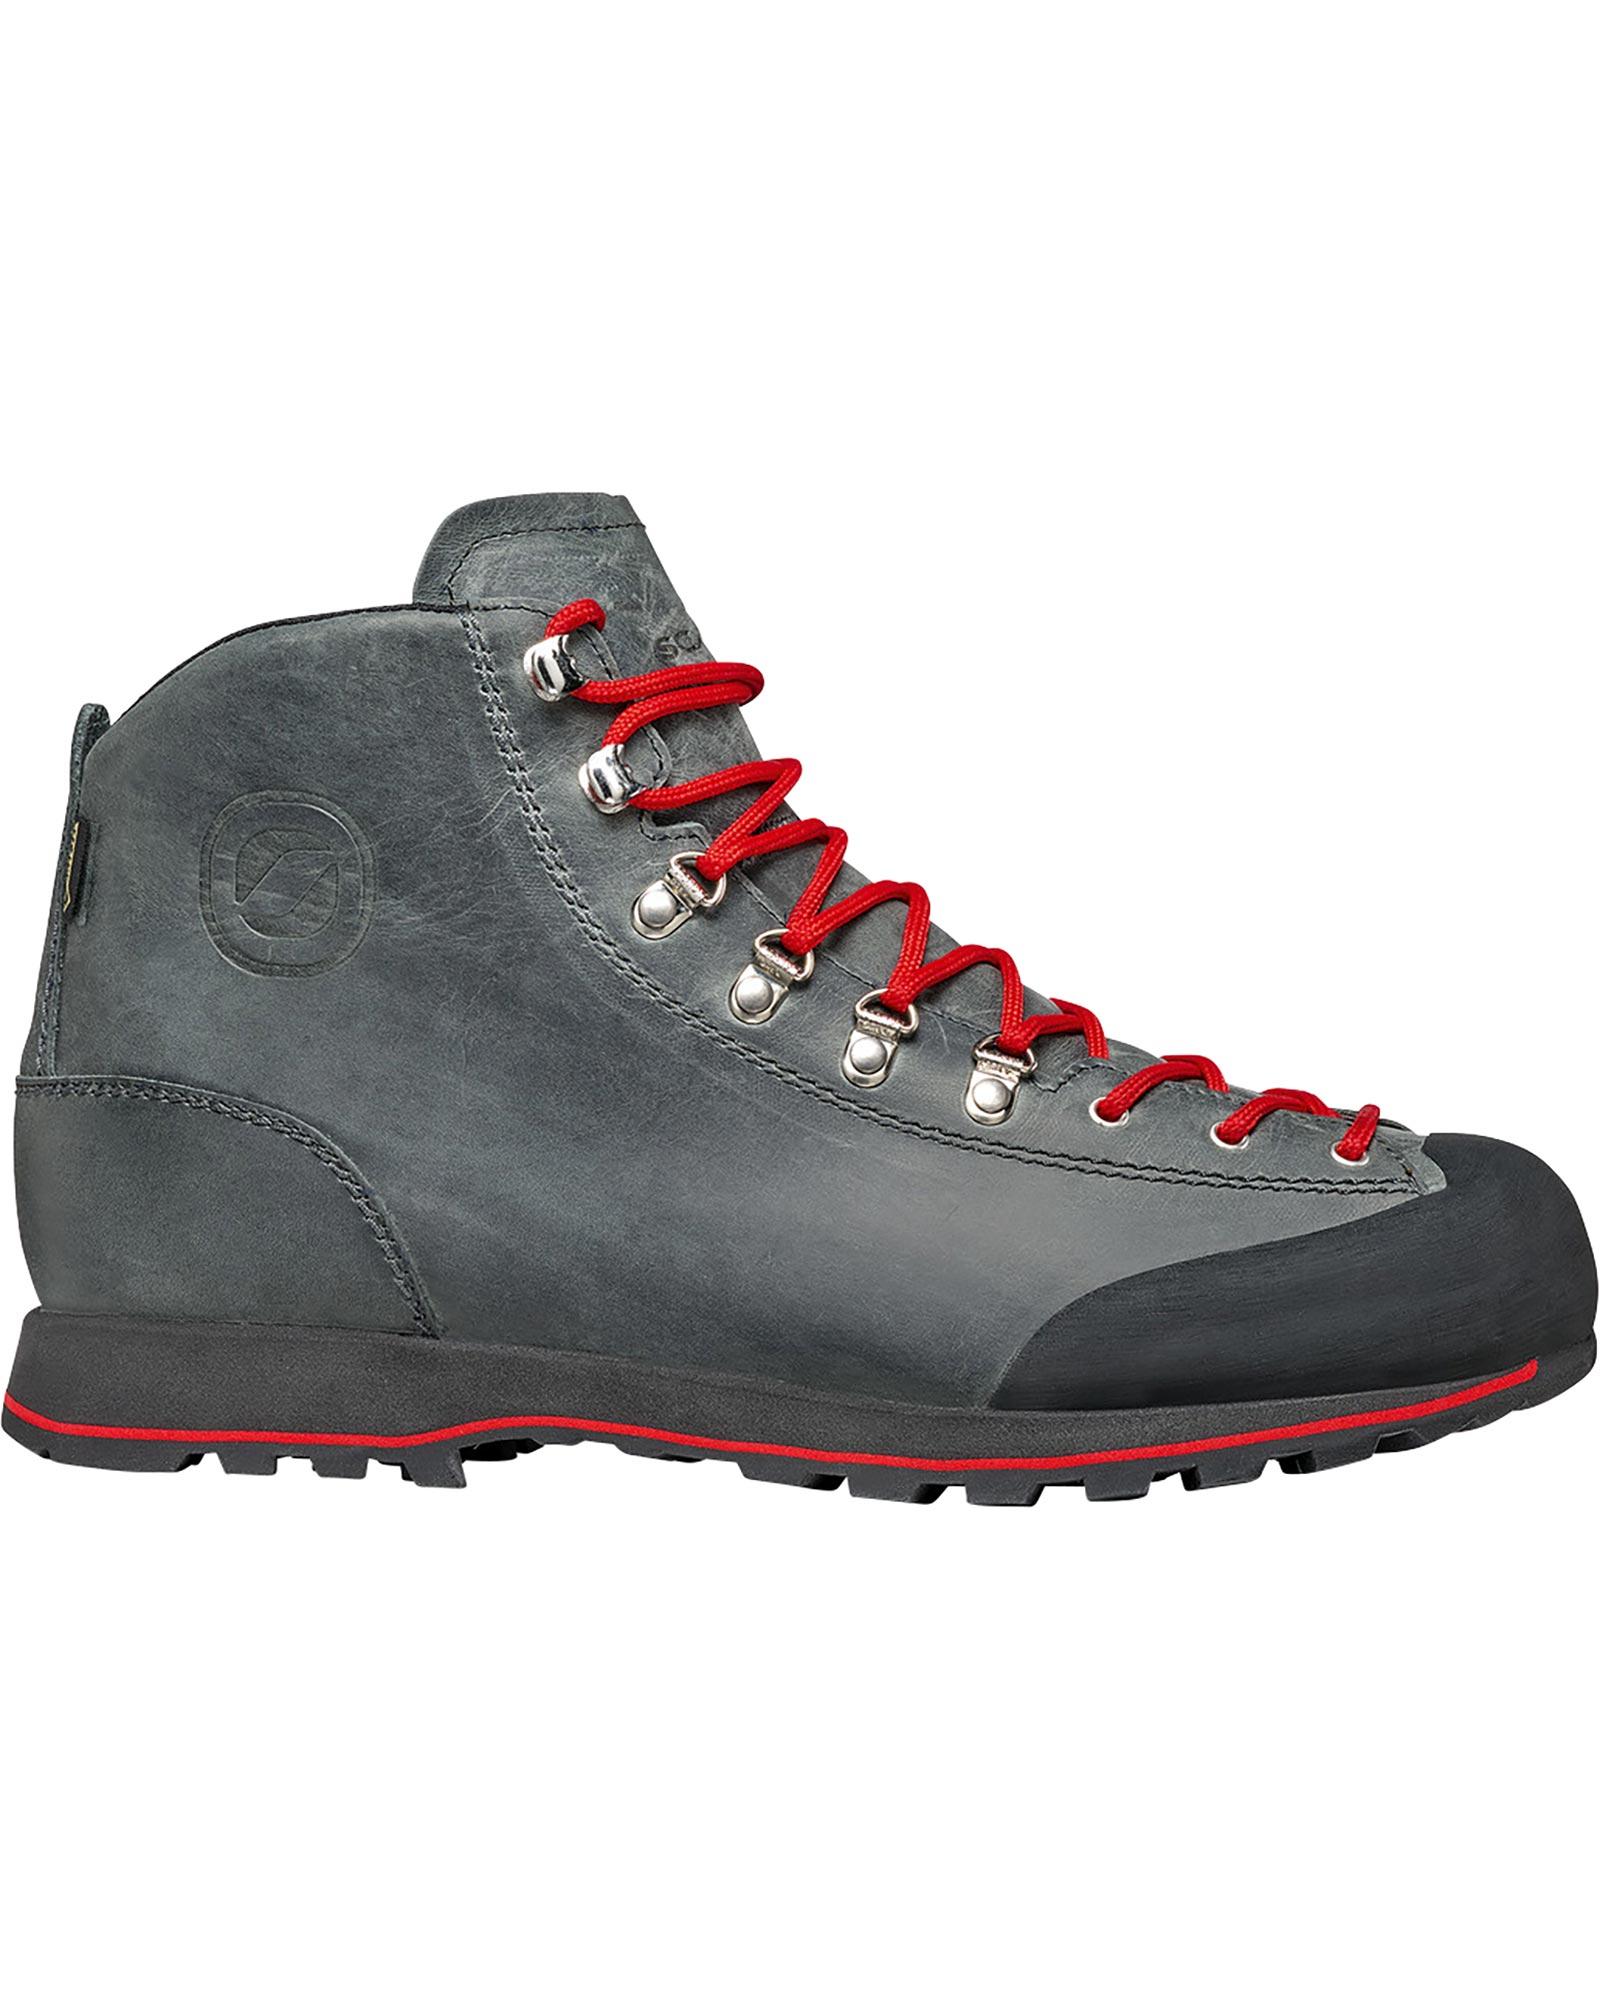 Scarpa Men's Guida City GORE-TEX Boots 0